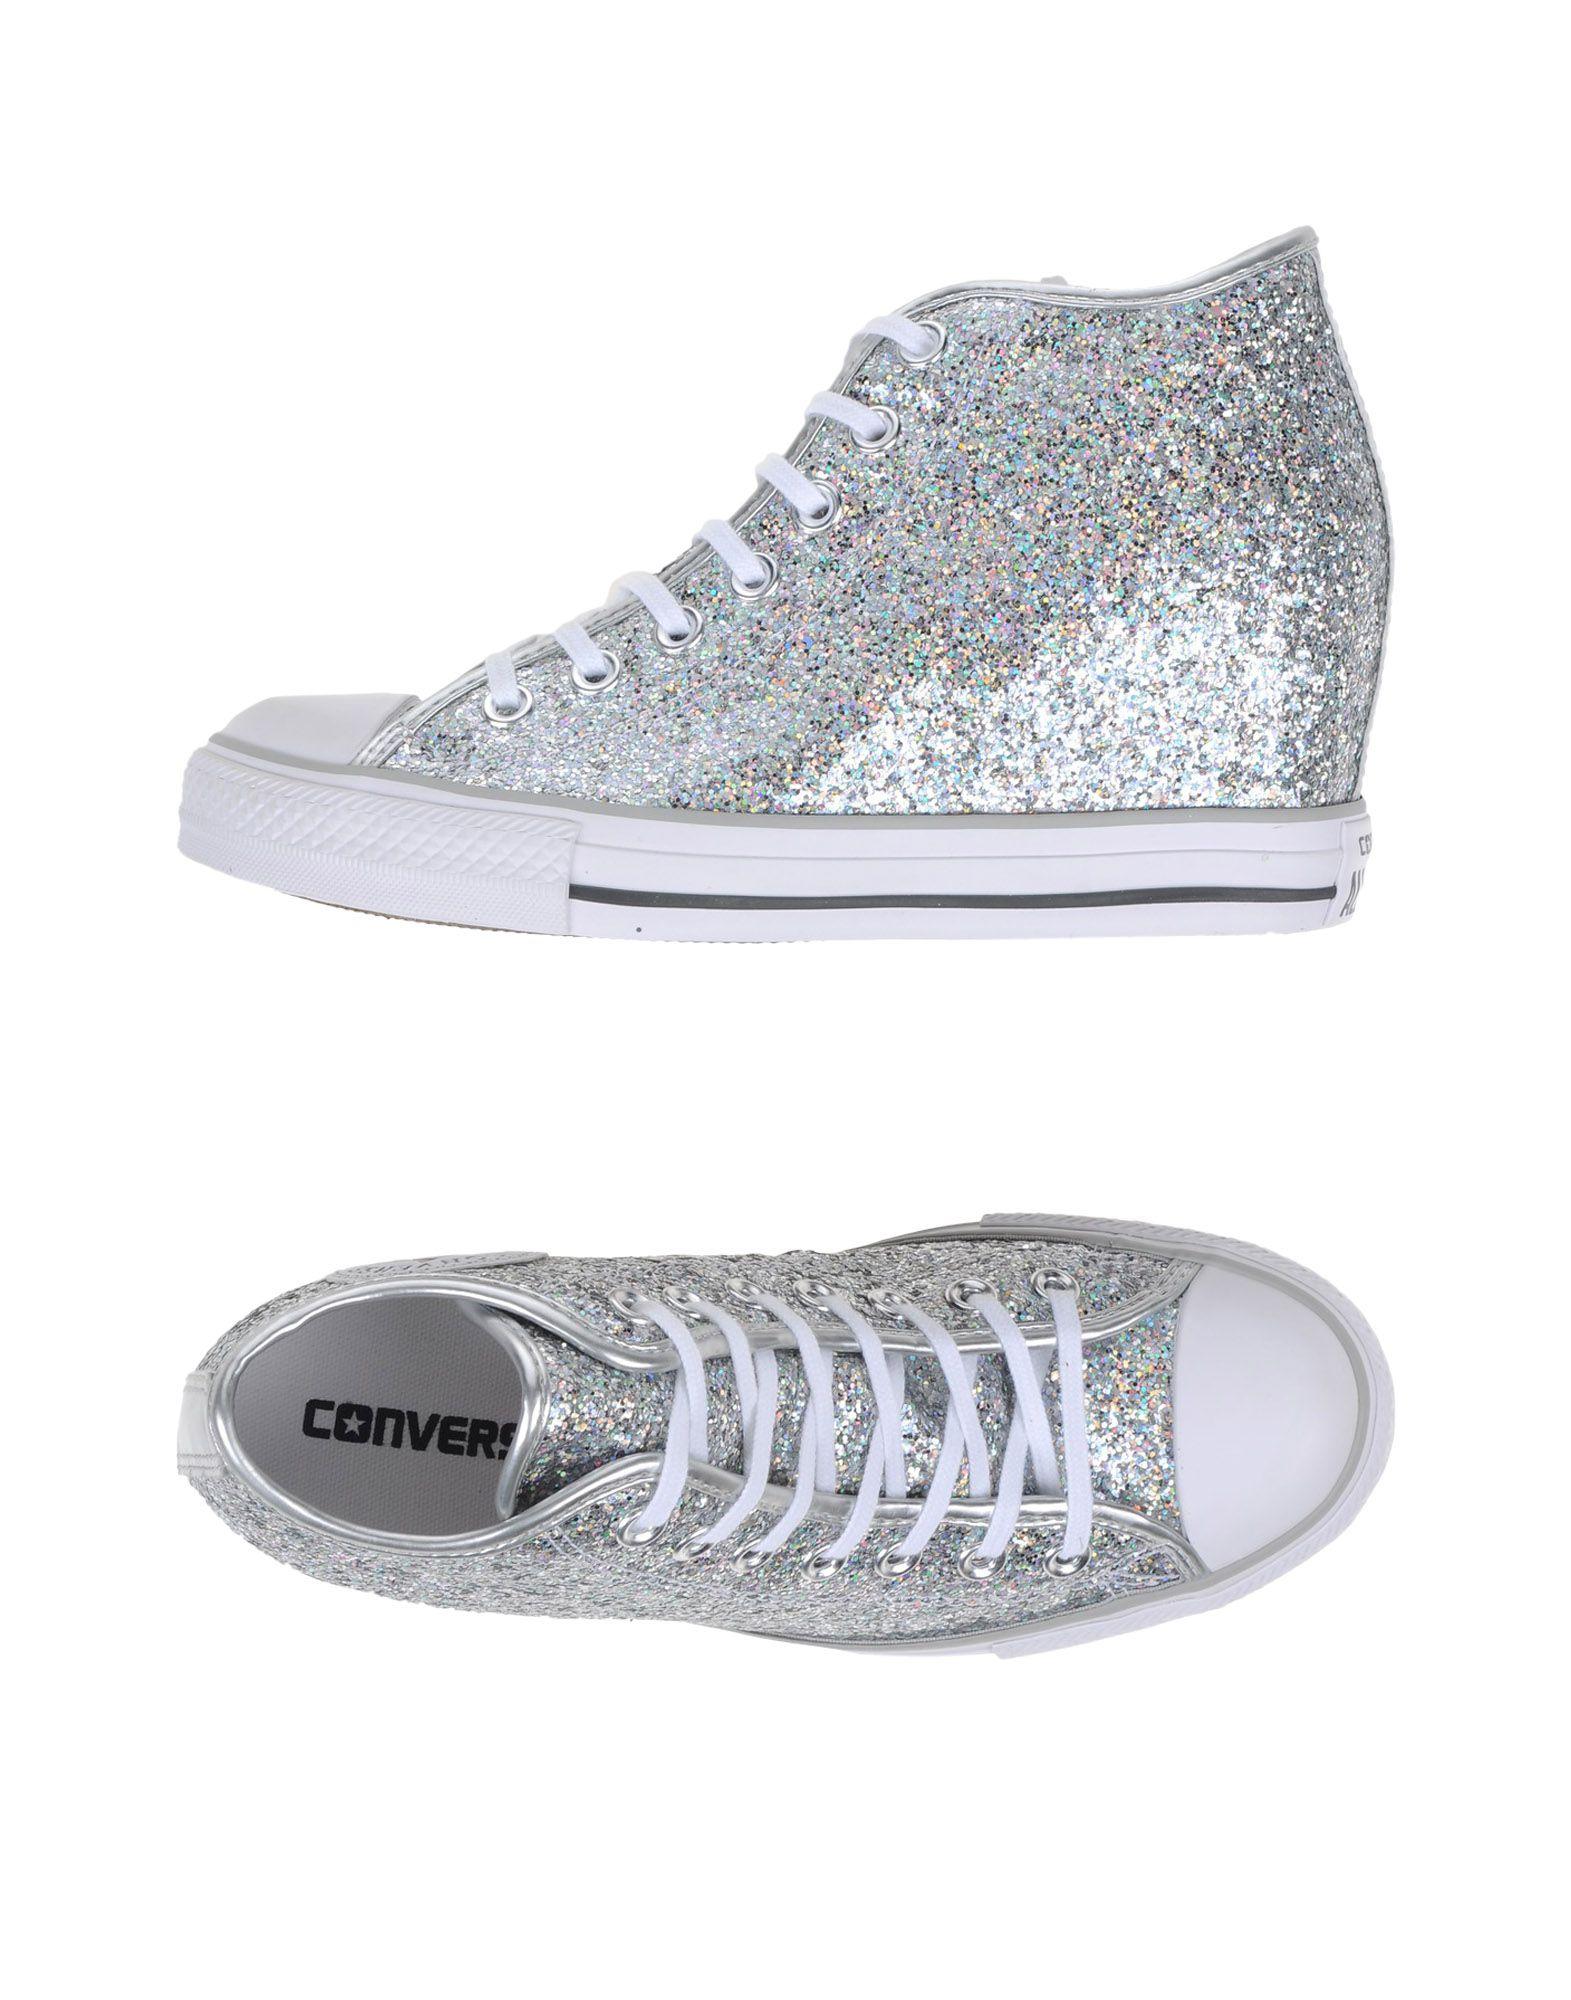 Scarpe da All Ginnastica Converse All Star All da Star Mid Lux Glitter - Donna - 11003402HS a6e908